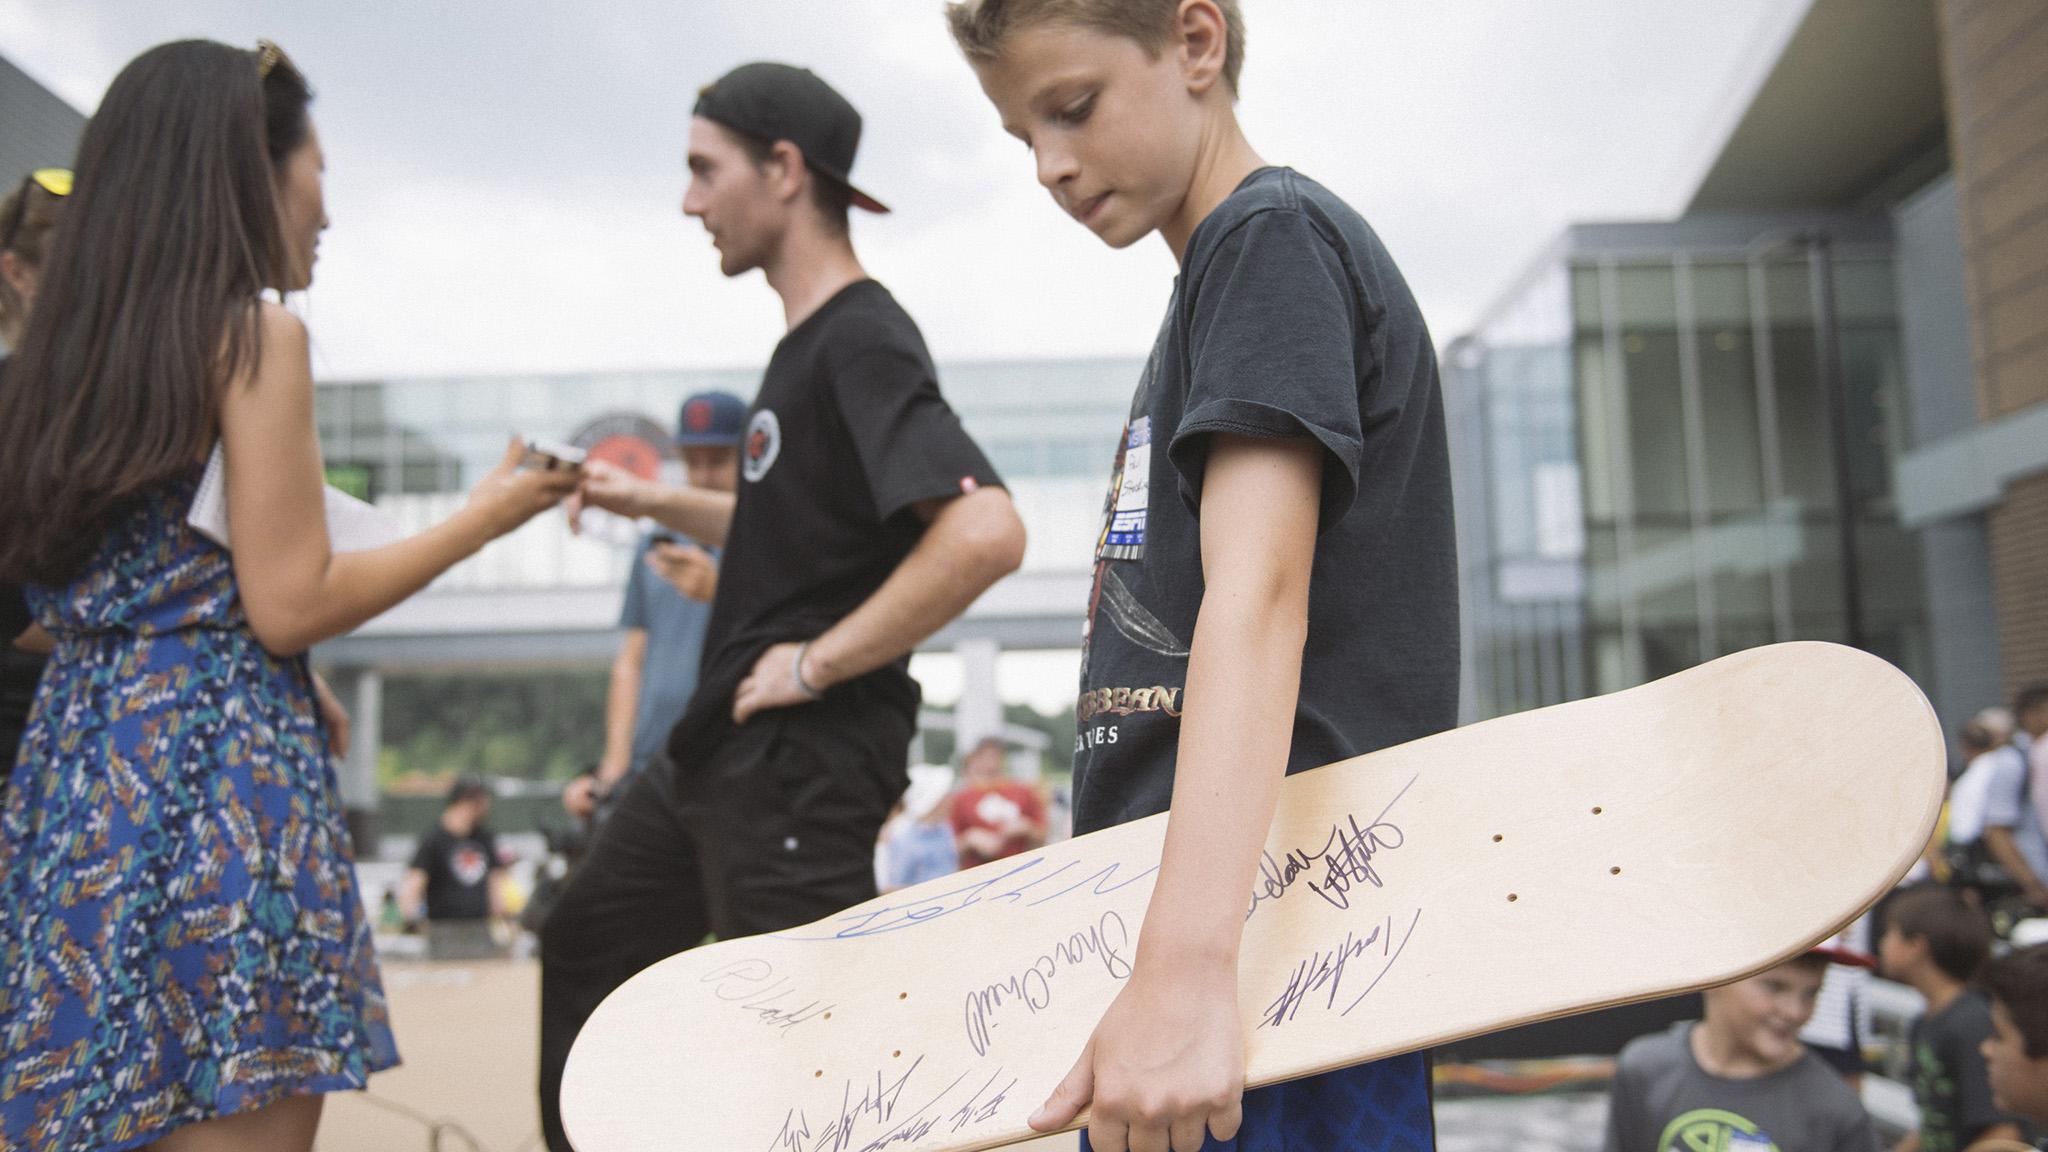 Game of Skate fans